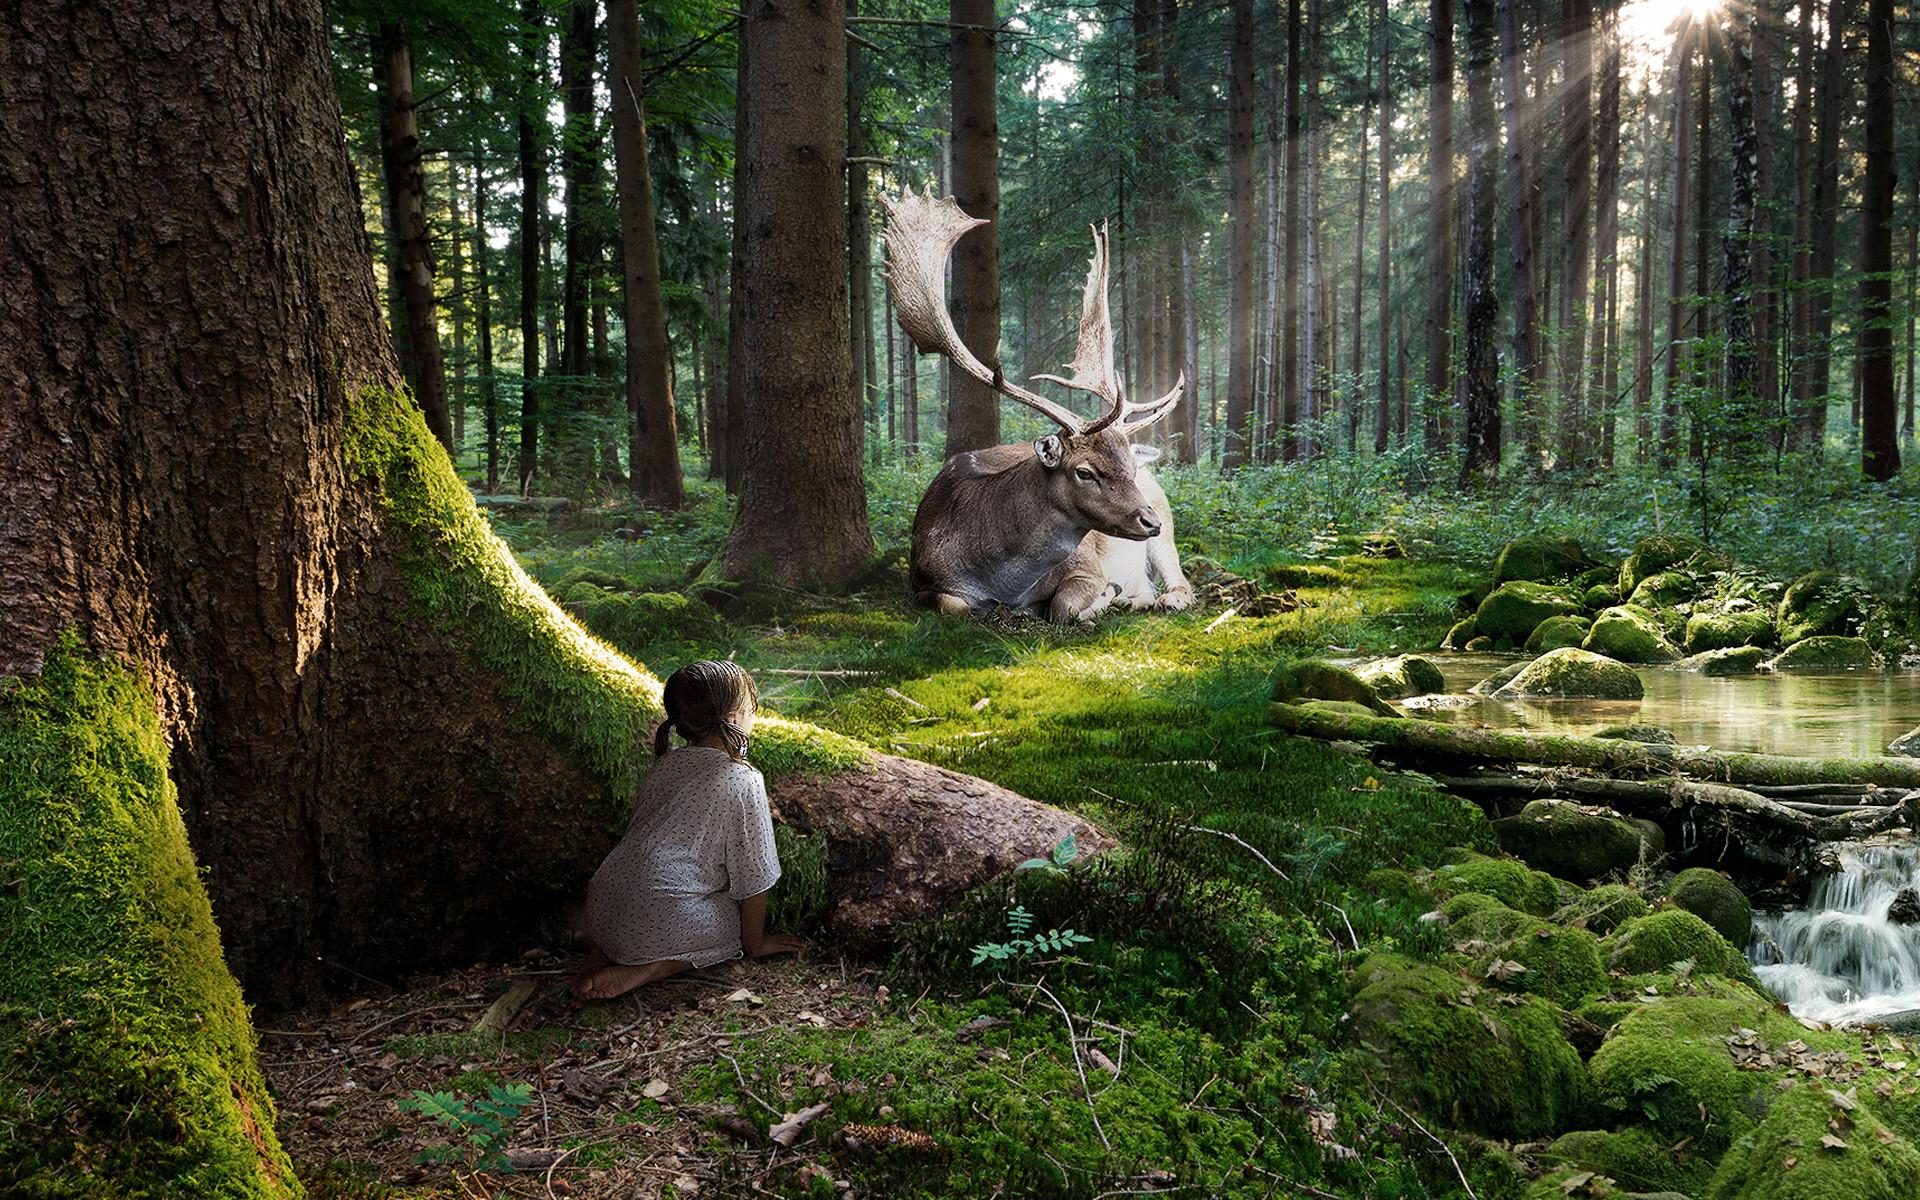 Fairytale Forest WallPaper HD – https://imashon.com/w/fantasy